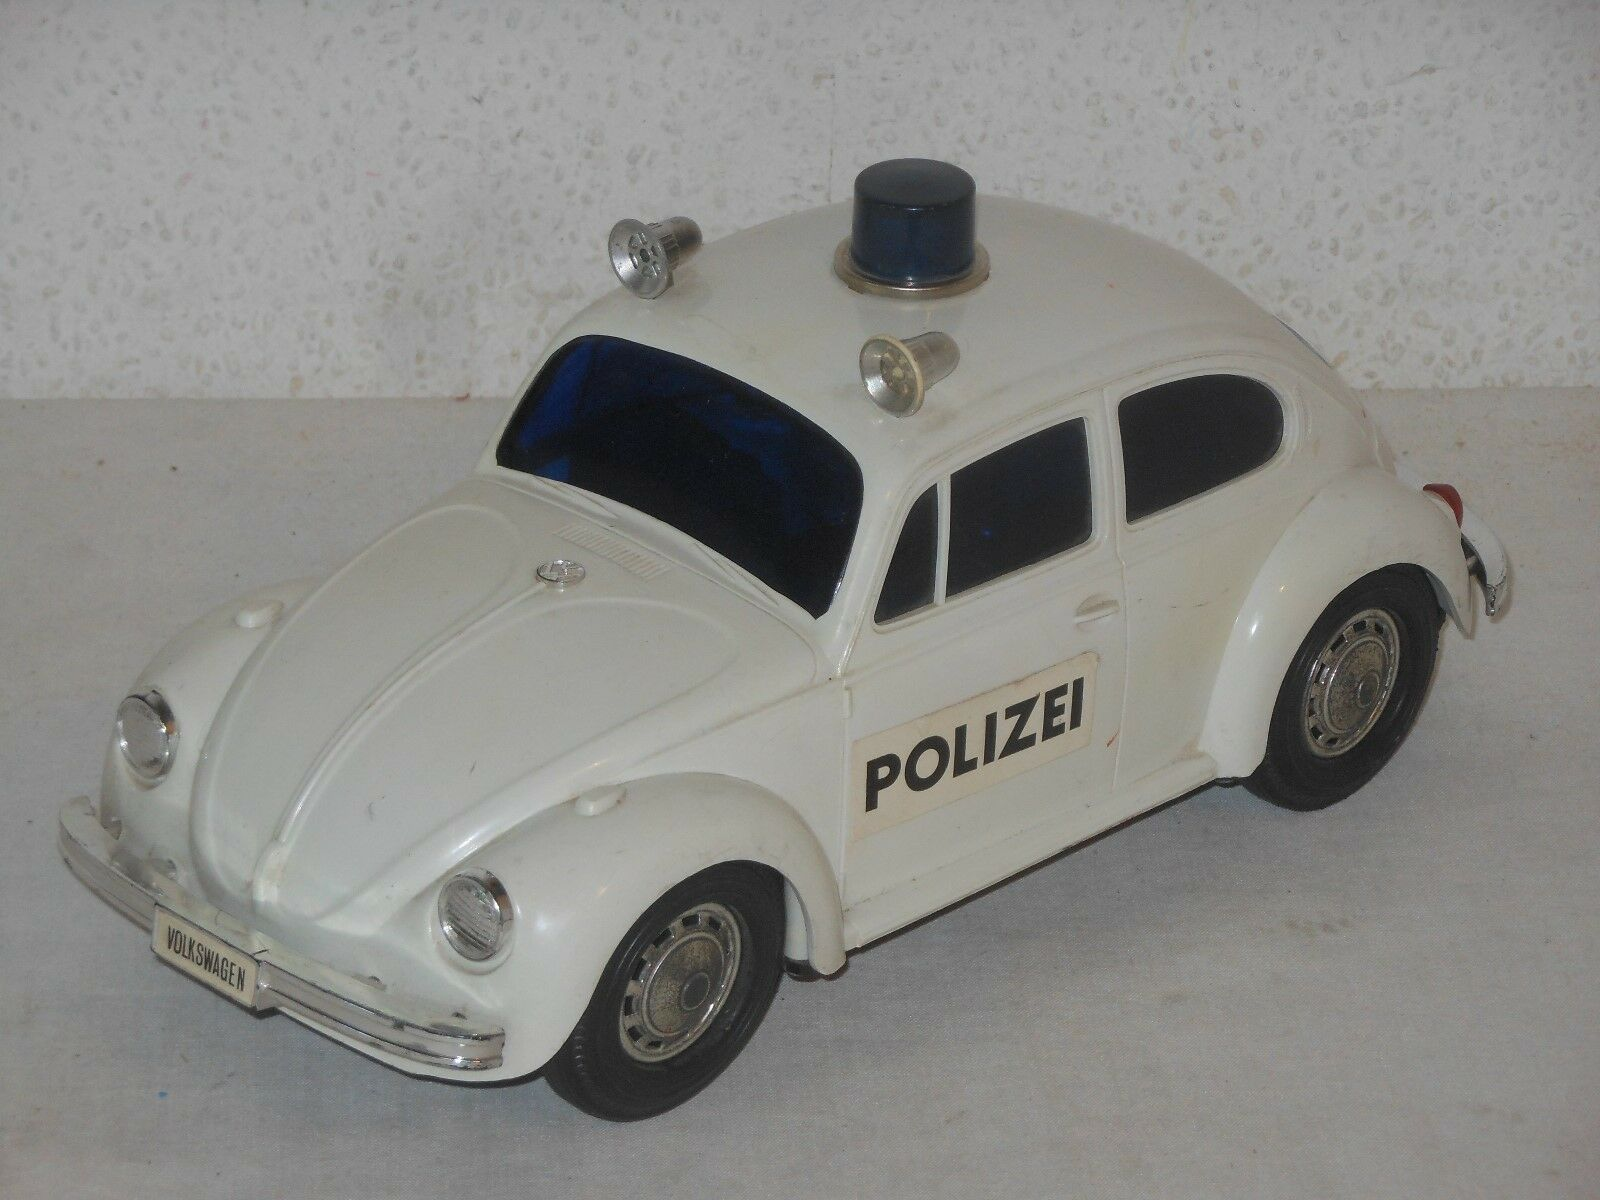 VW VOLKSWAGEN KÄFER BEETLE POLIZEI - 26 cm VINTAGE TOY - JAPAN - 12